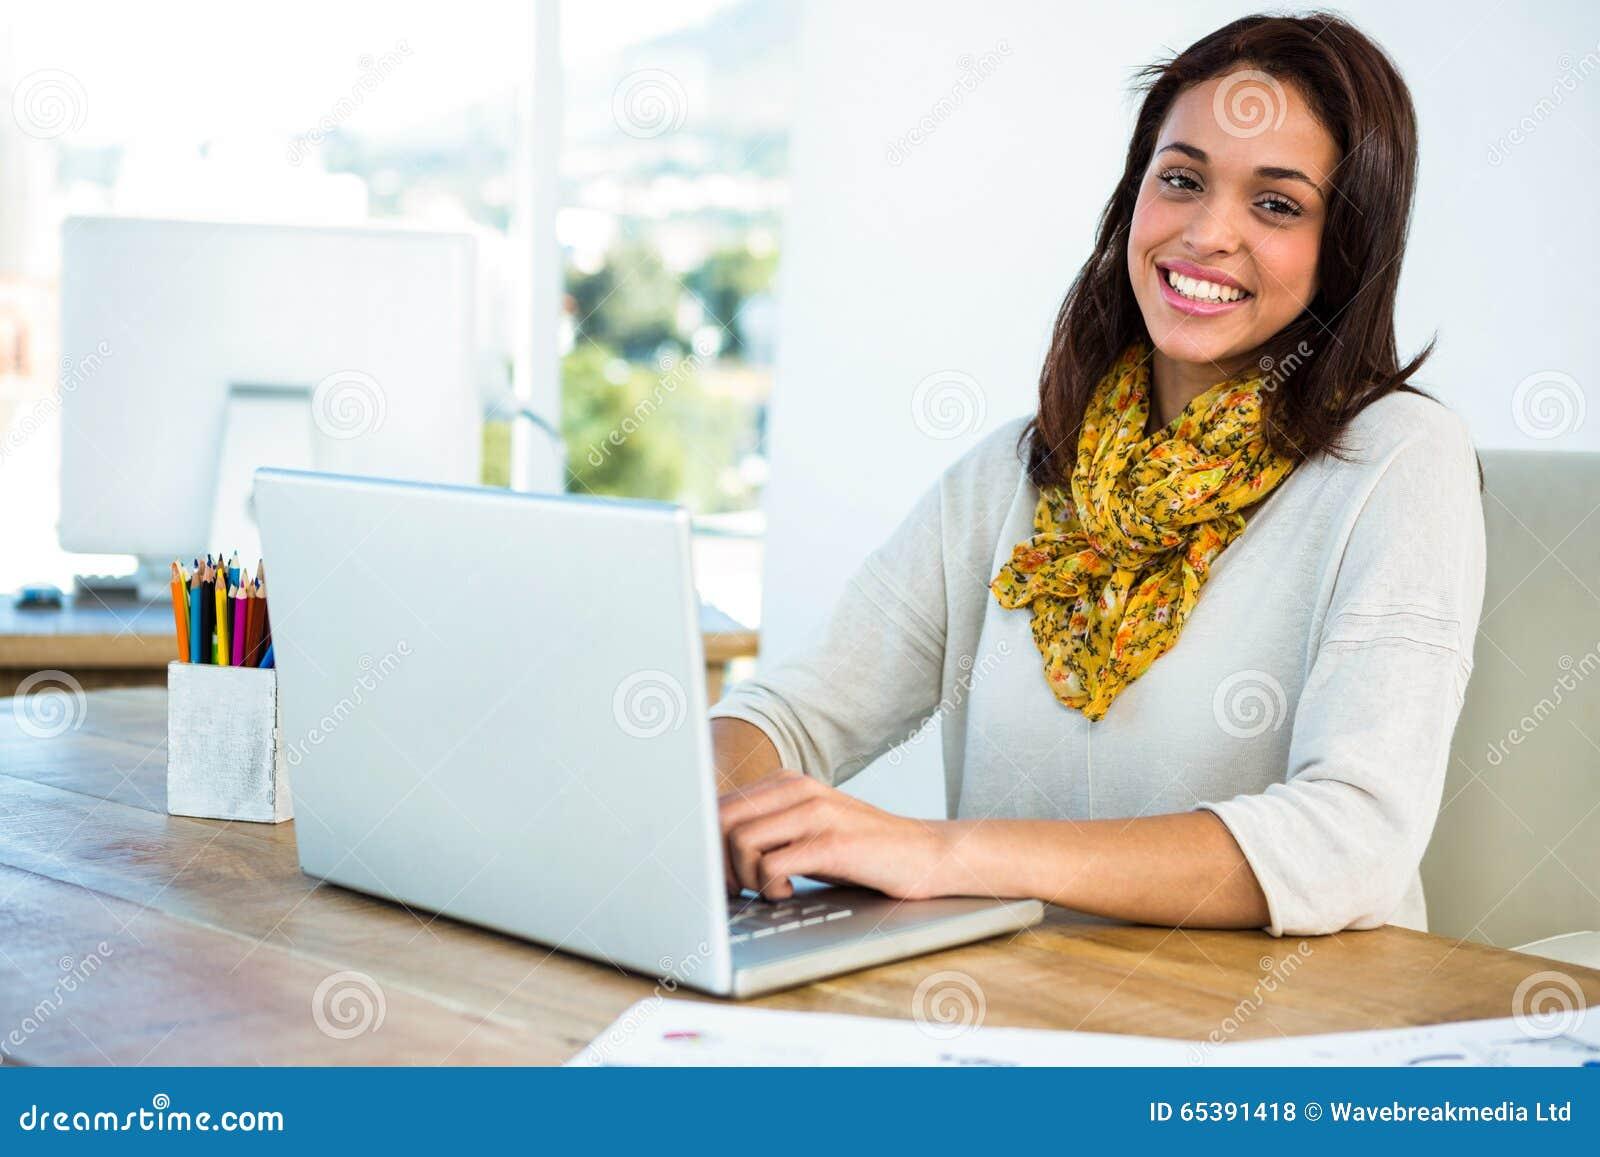 Young girl uses his computer